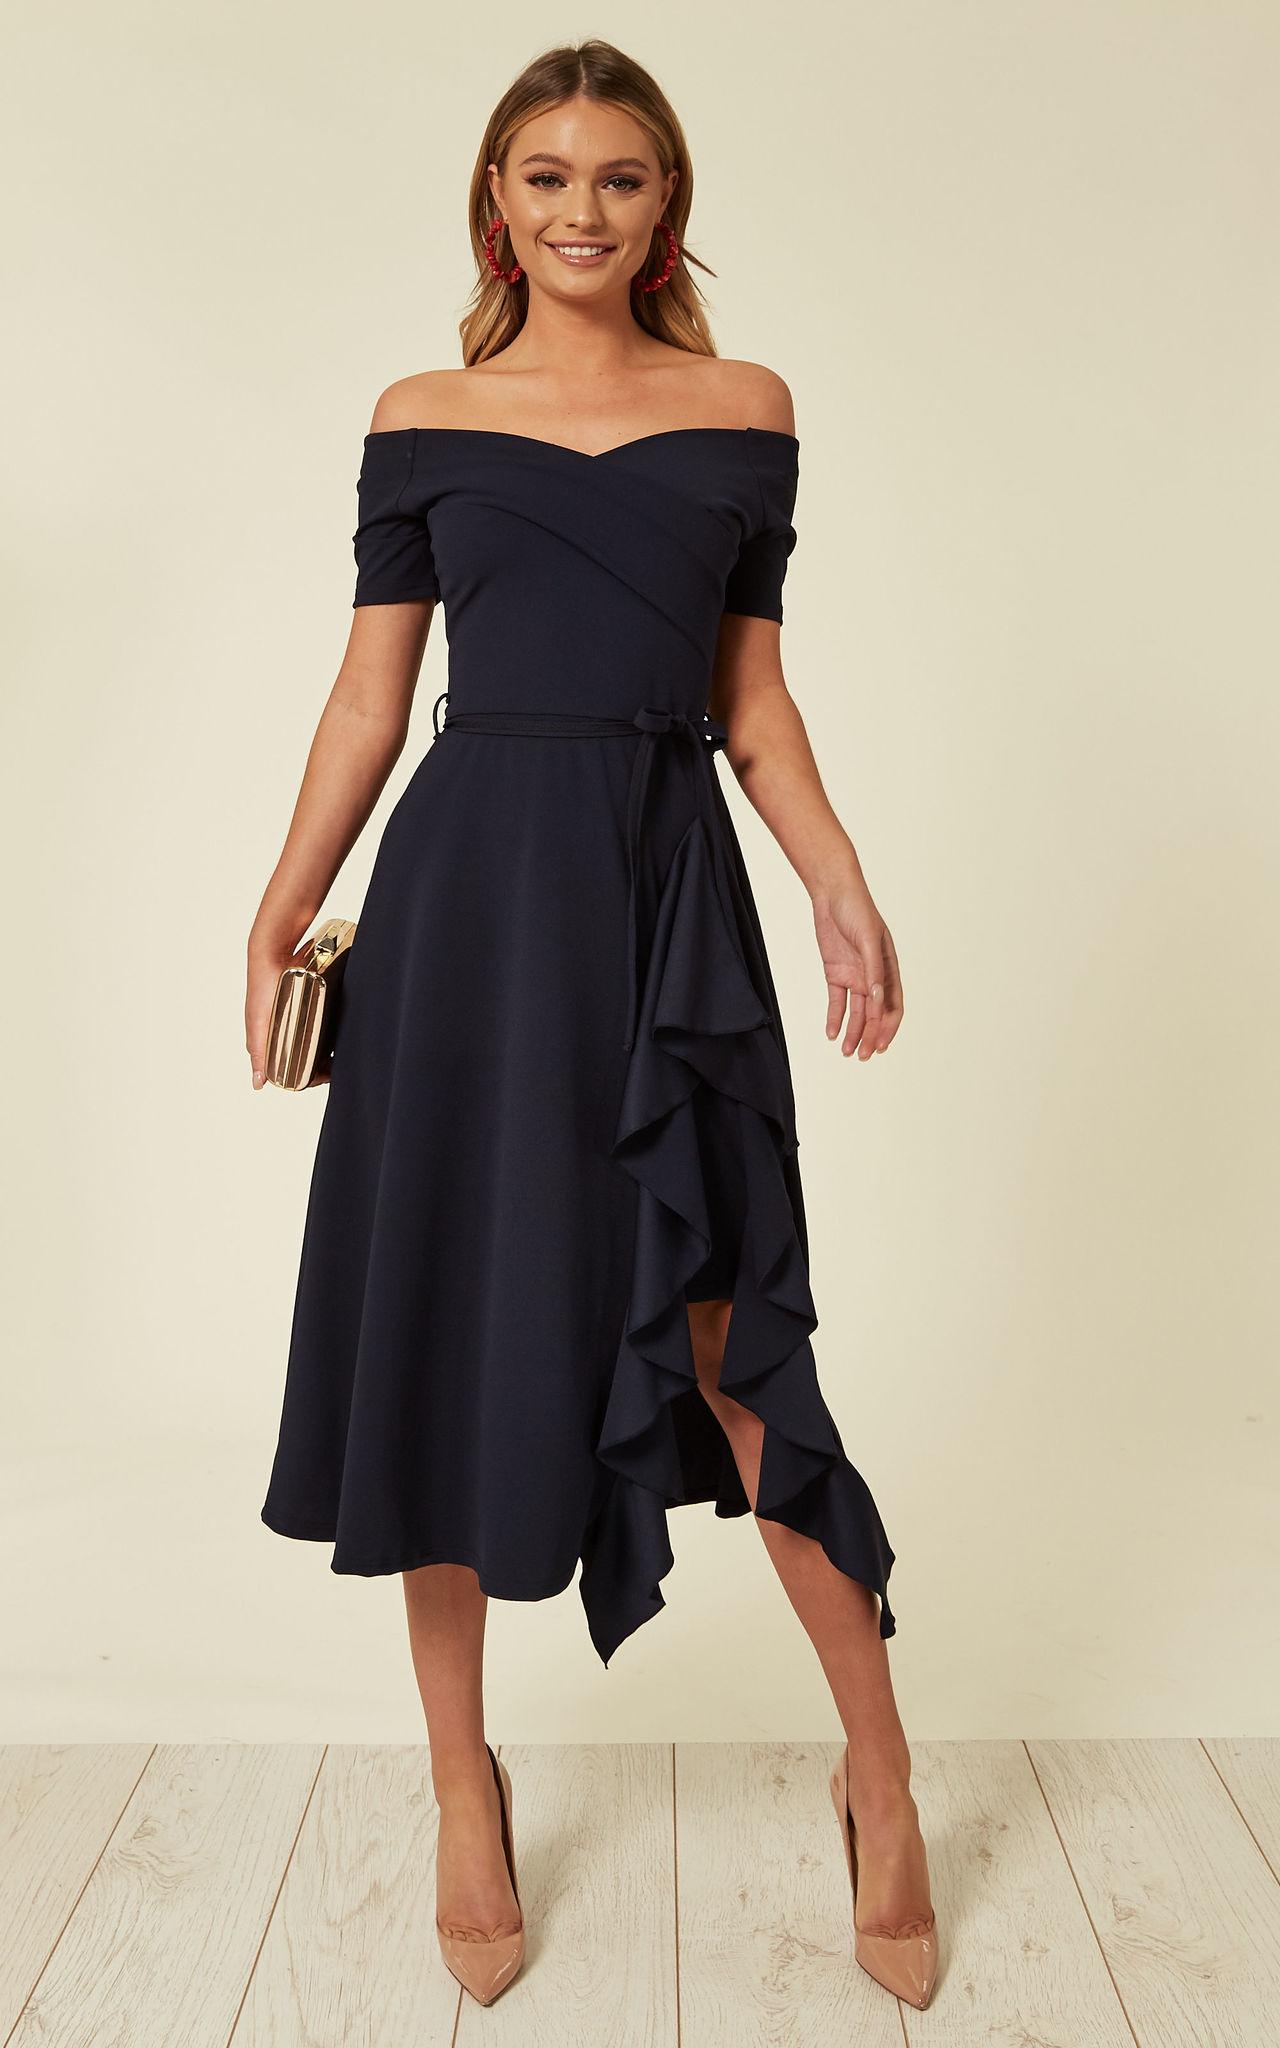 Exclusive Bardot Off Shoulder Frill Midi Dress Navy - Image Via SilkFred.com